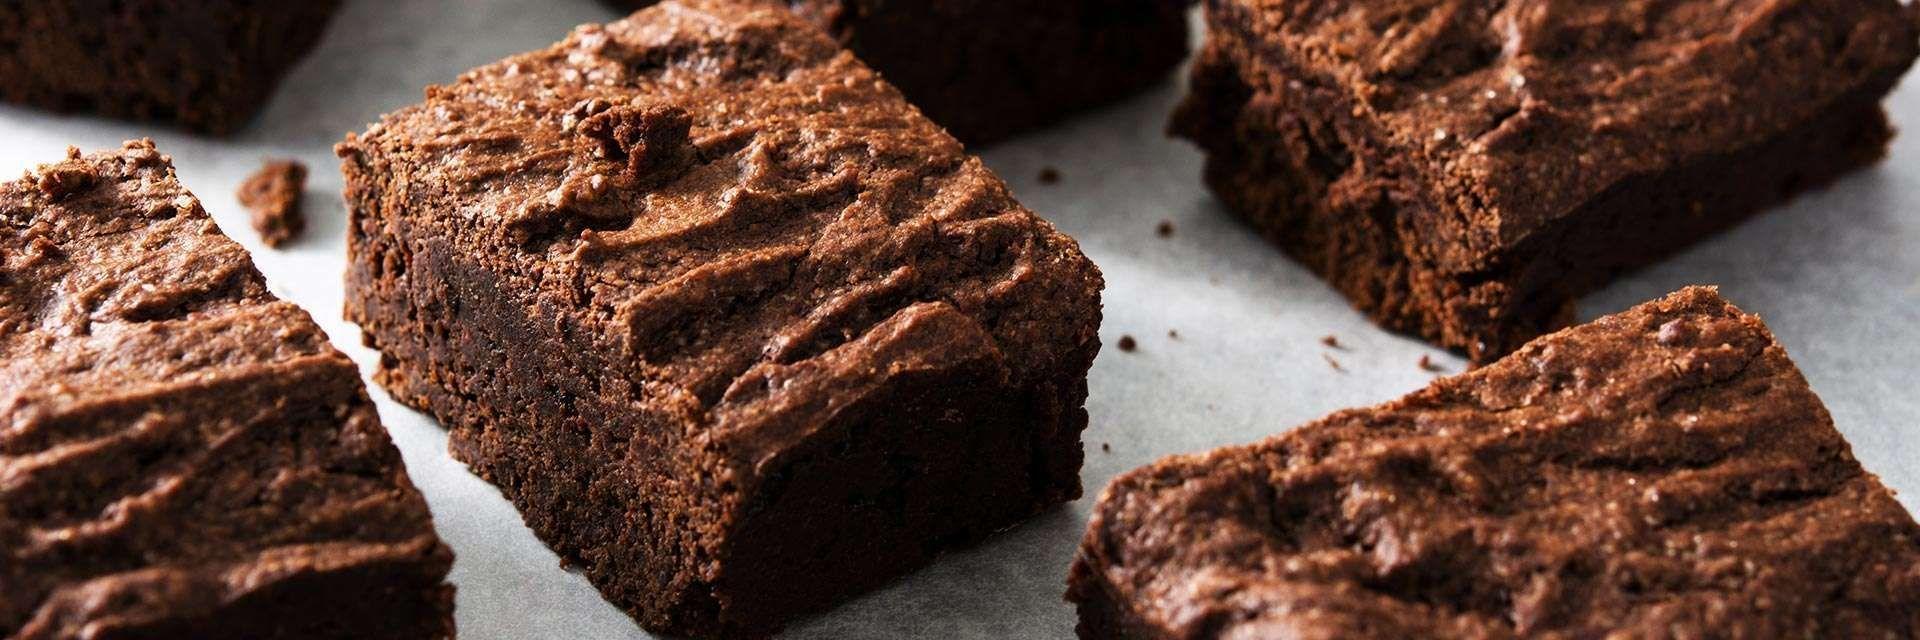 brownie de chocolate 70%